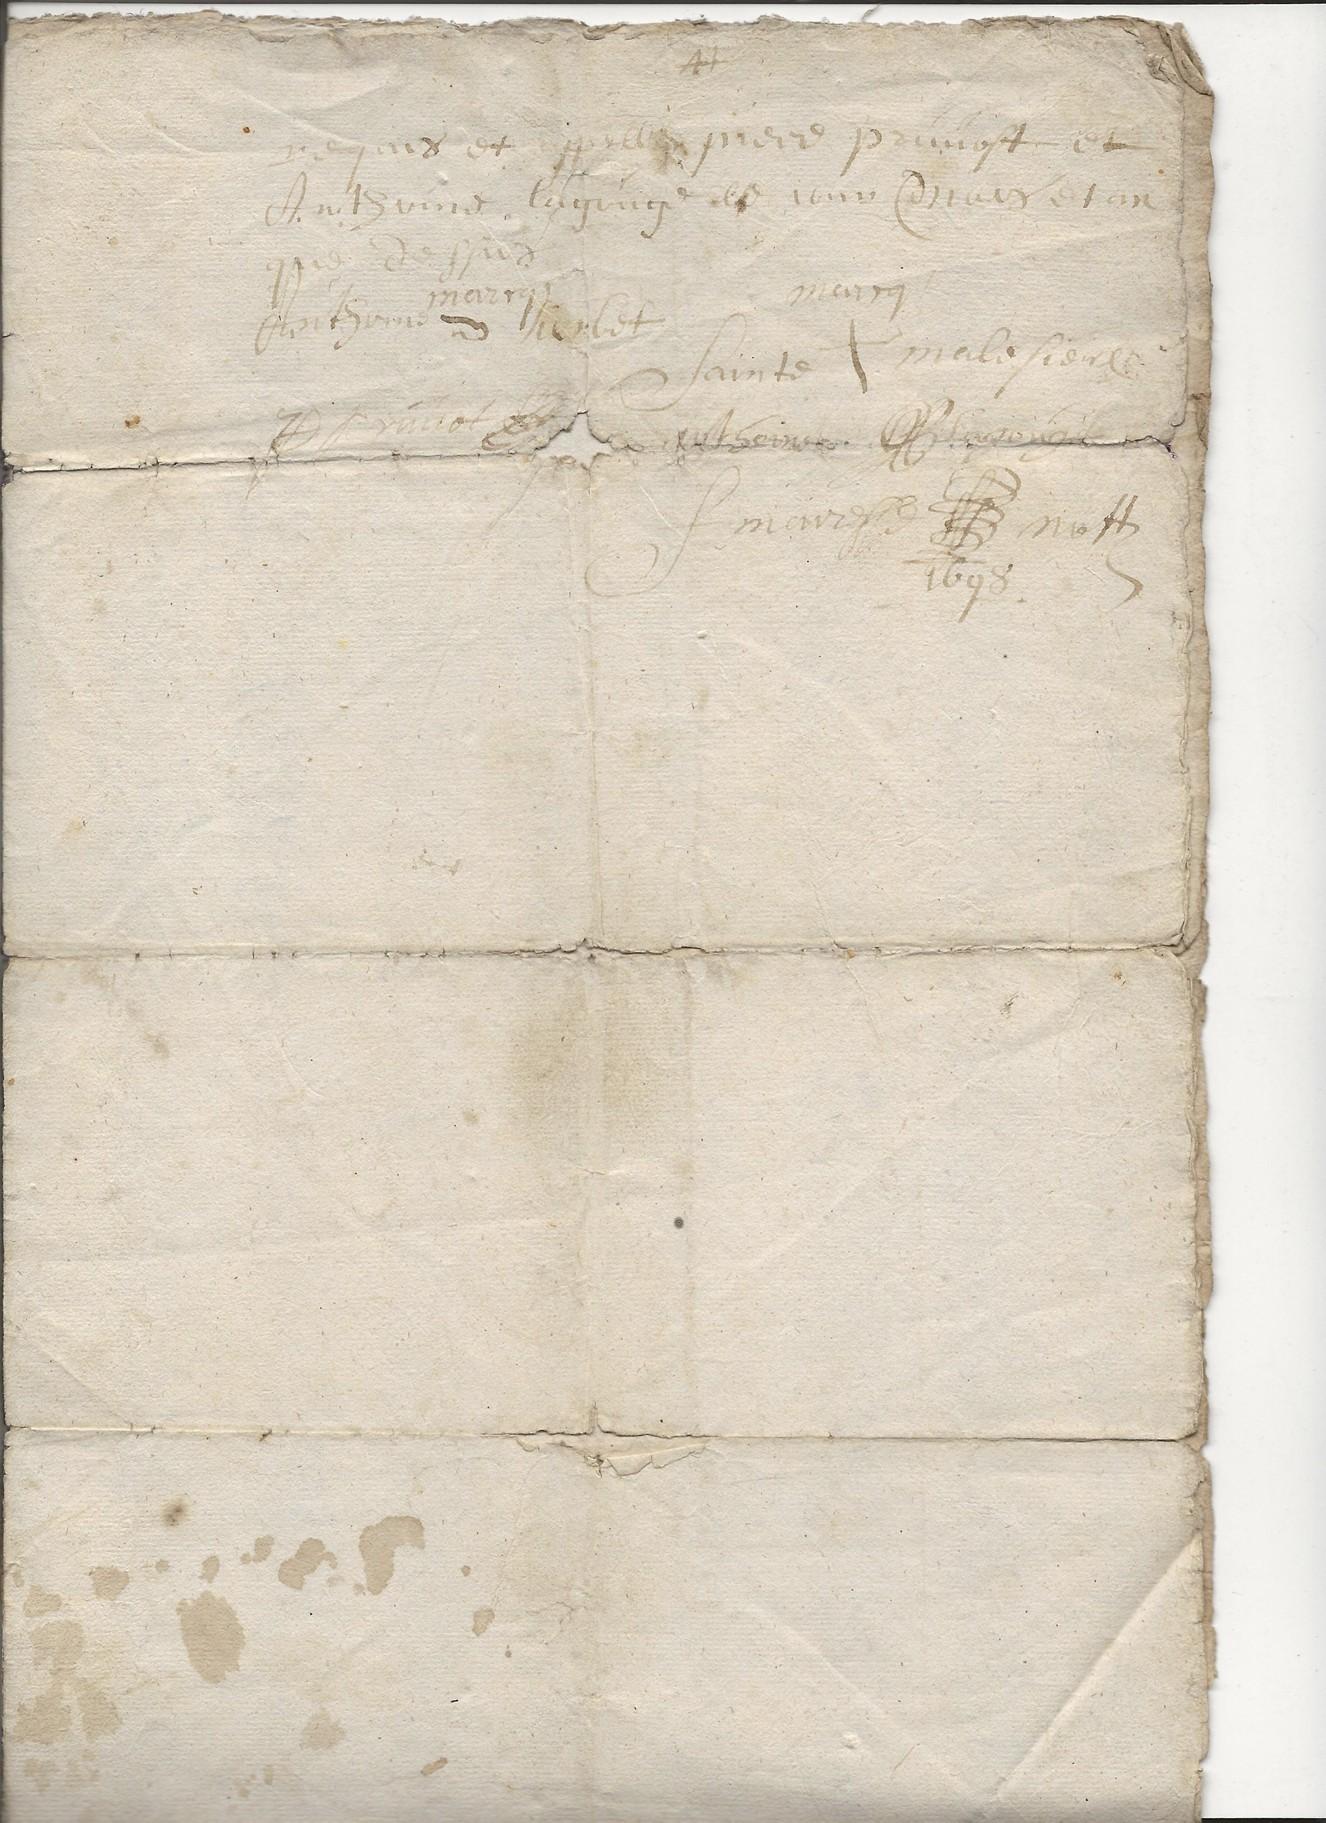 1697 acte concernant jean pruvot 6